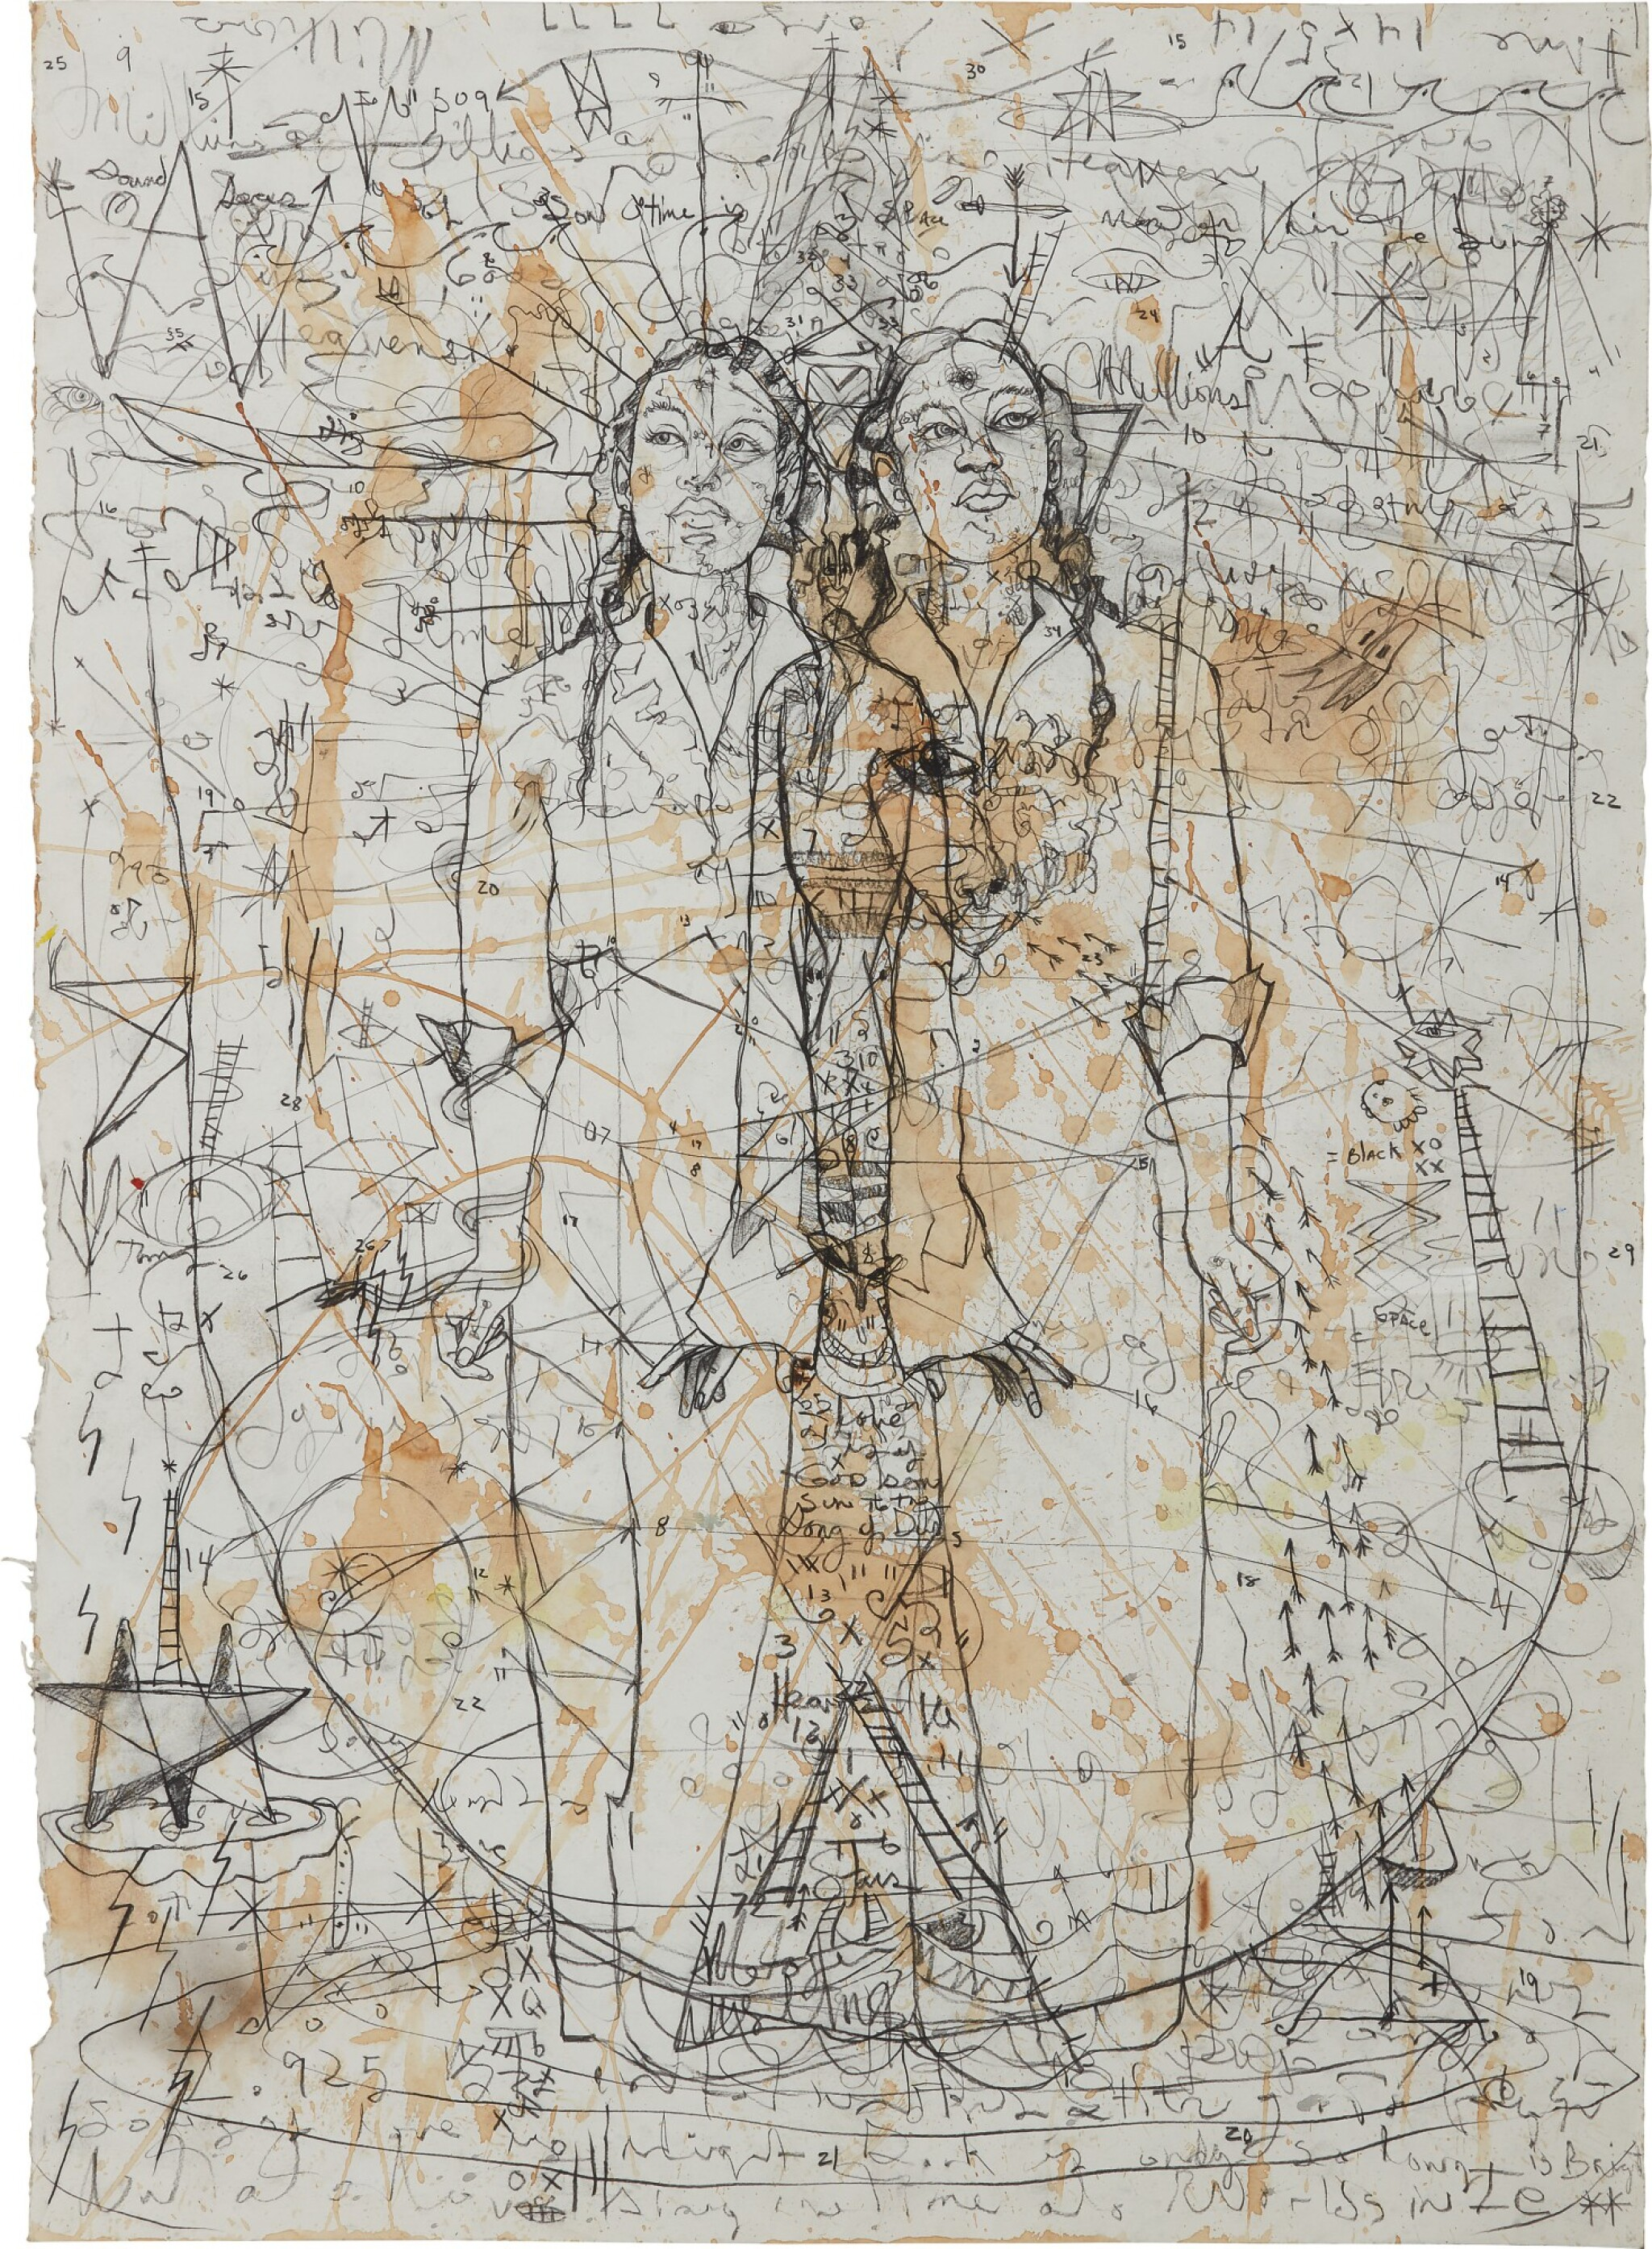 ANGELBERT METOYER | DAUGHTERS OF THUNDER (ANCIENT INFINITY ANGELS SERIES)